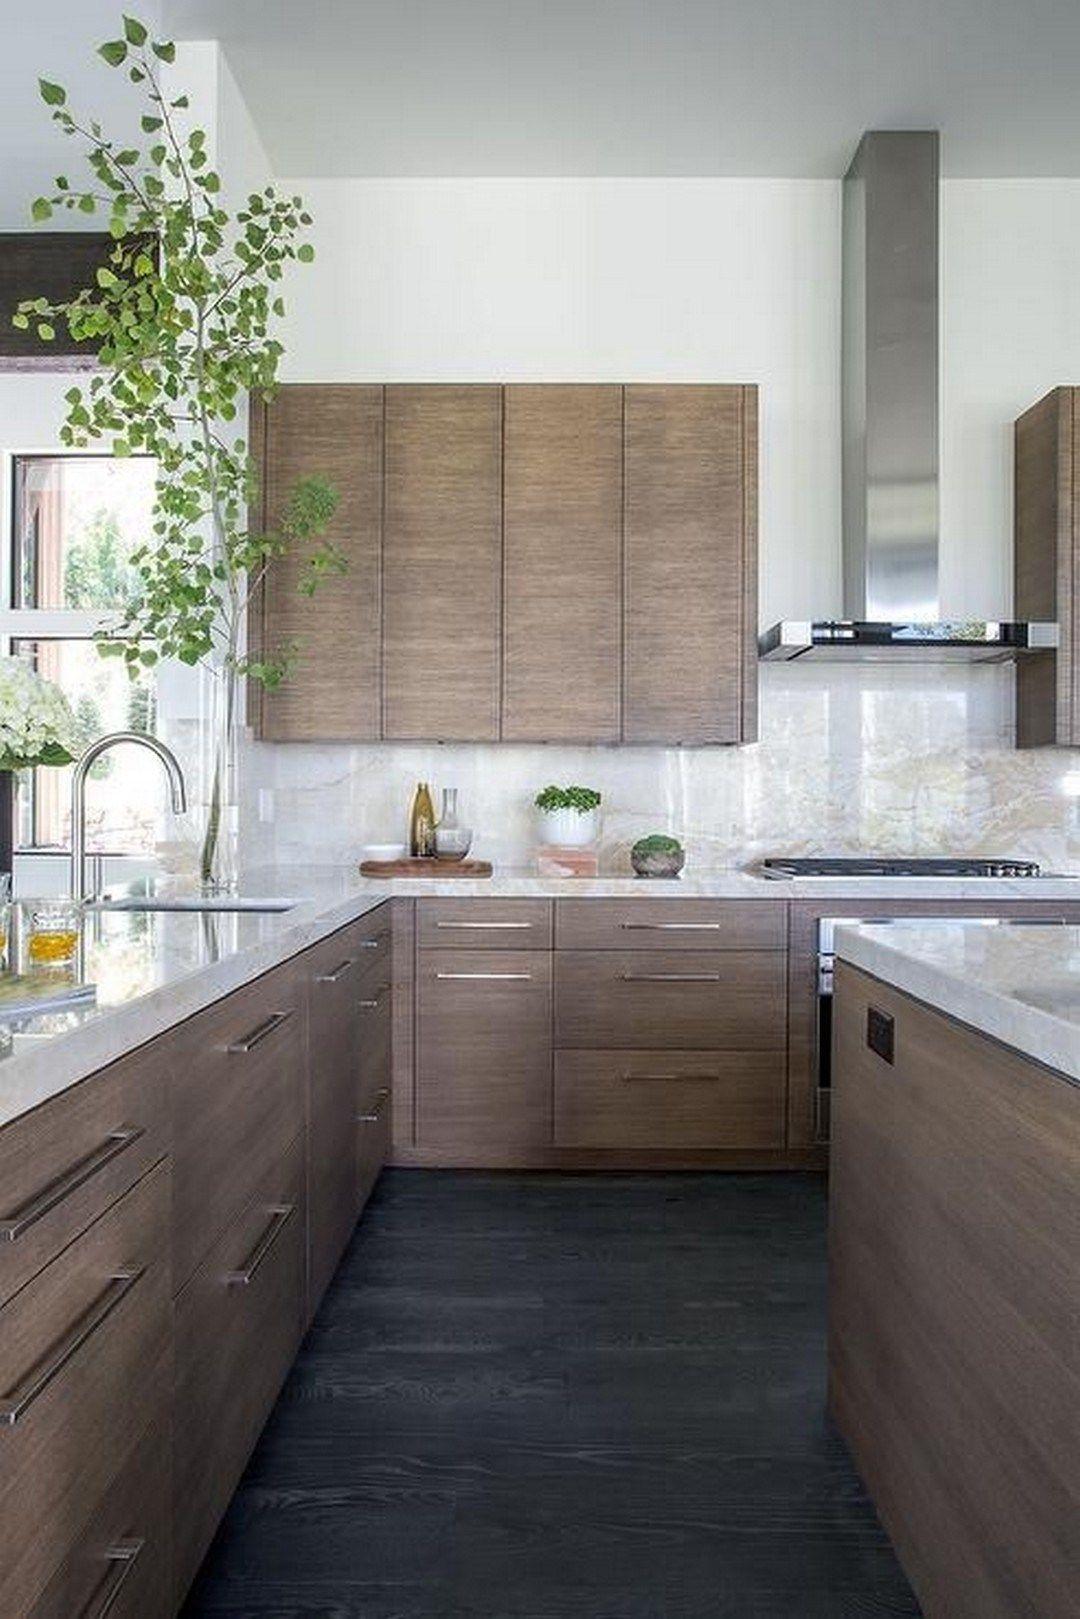 elegant simple kitchen cabinets ideas modern kitchen cabinets modern kitchen design kitchen on kitchen ideas simple id=68954